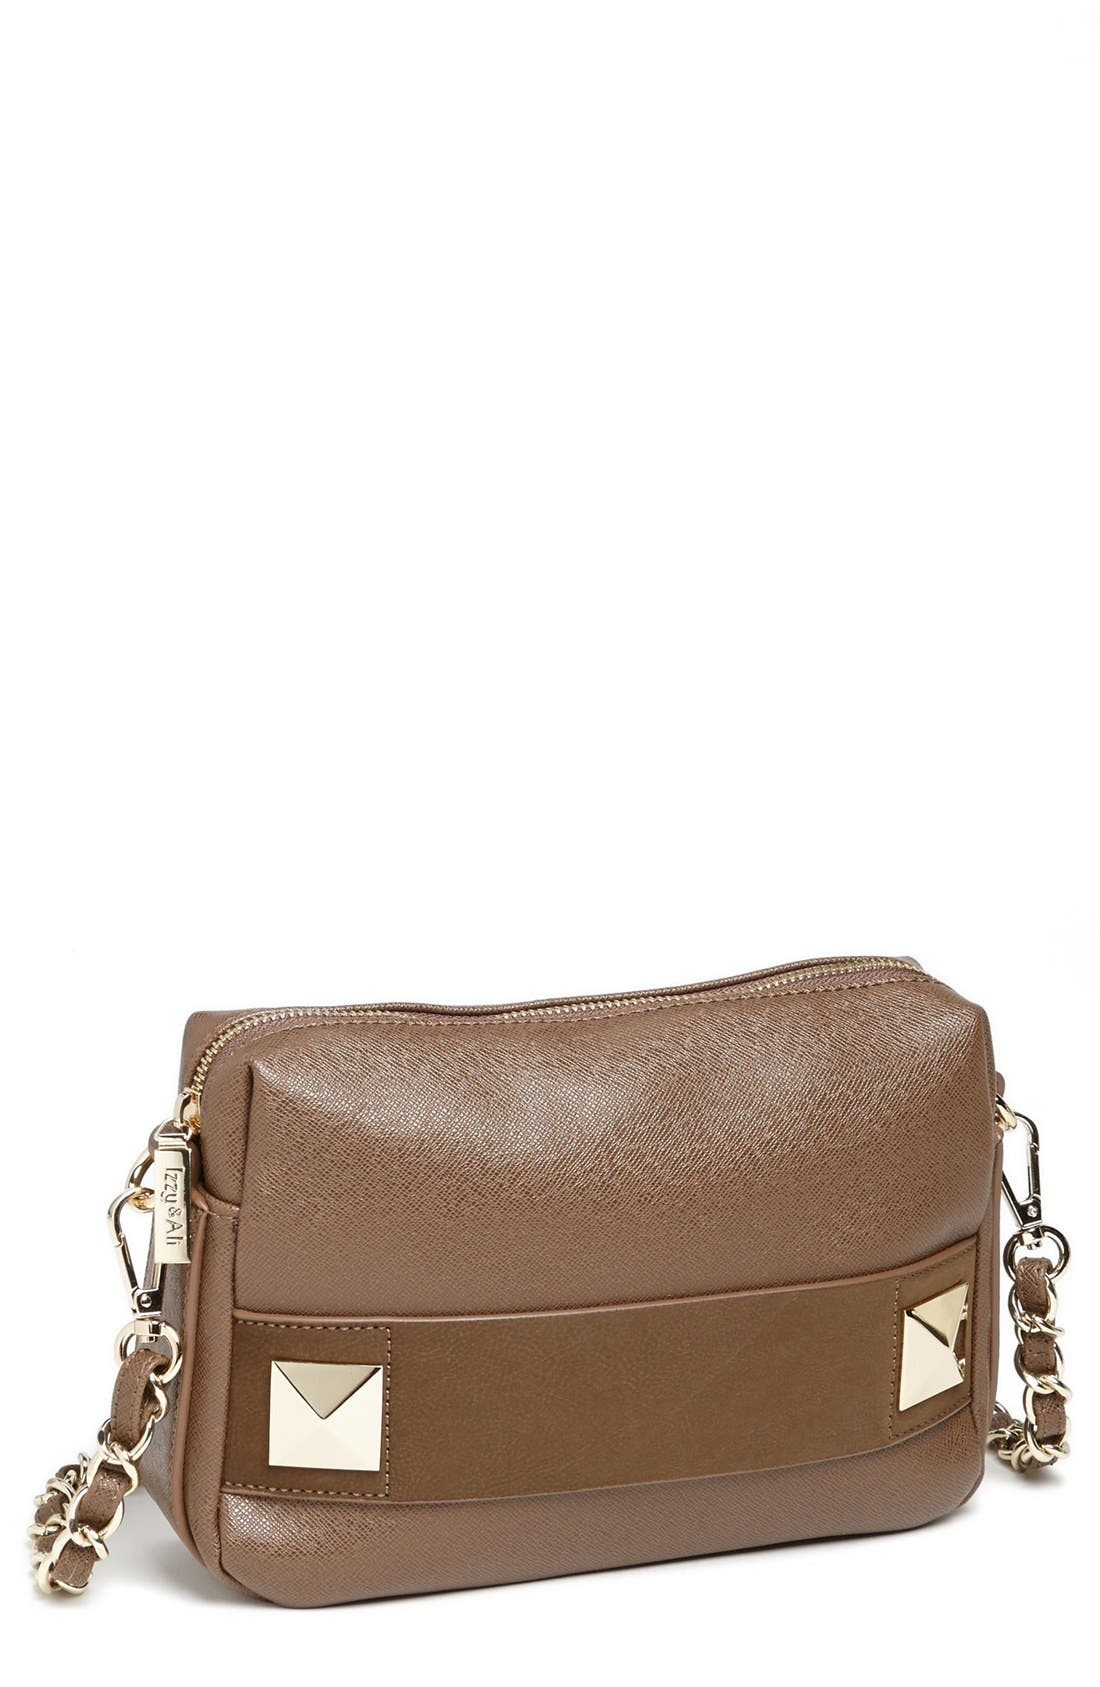 Main Image - Izzy & Ali 'Ella' Faux Leather Crossbody Bag